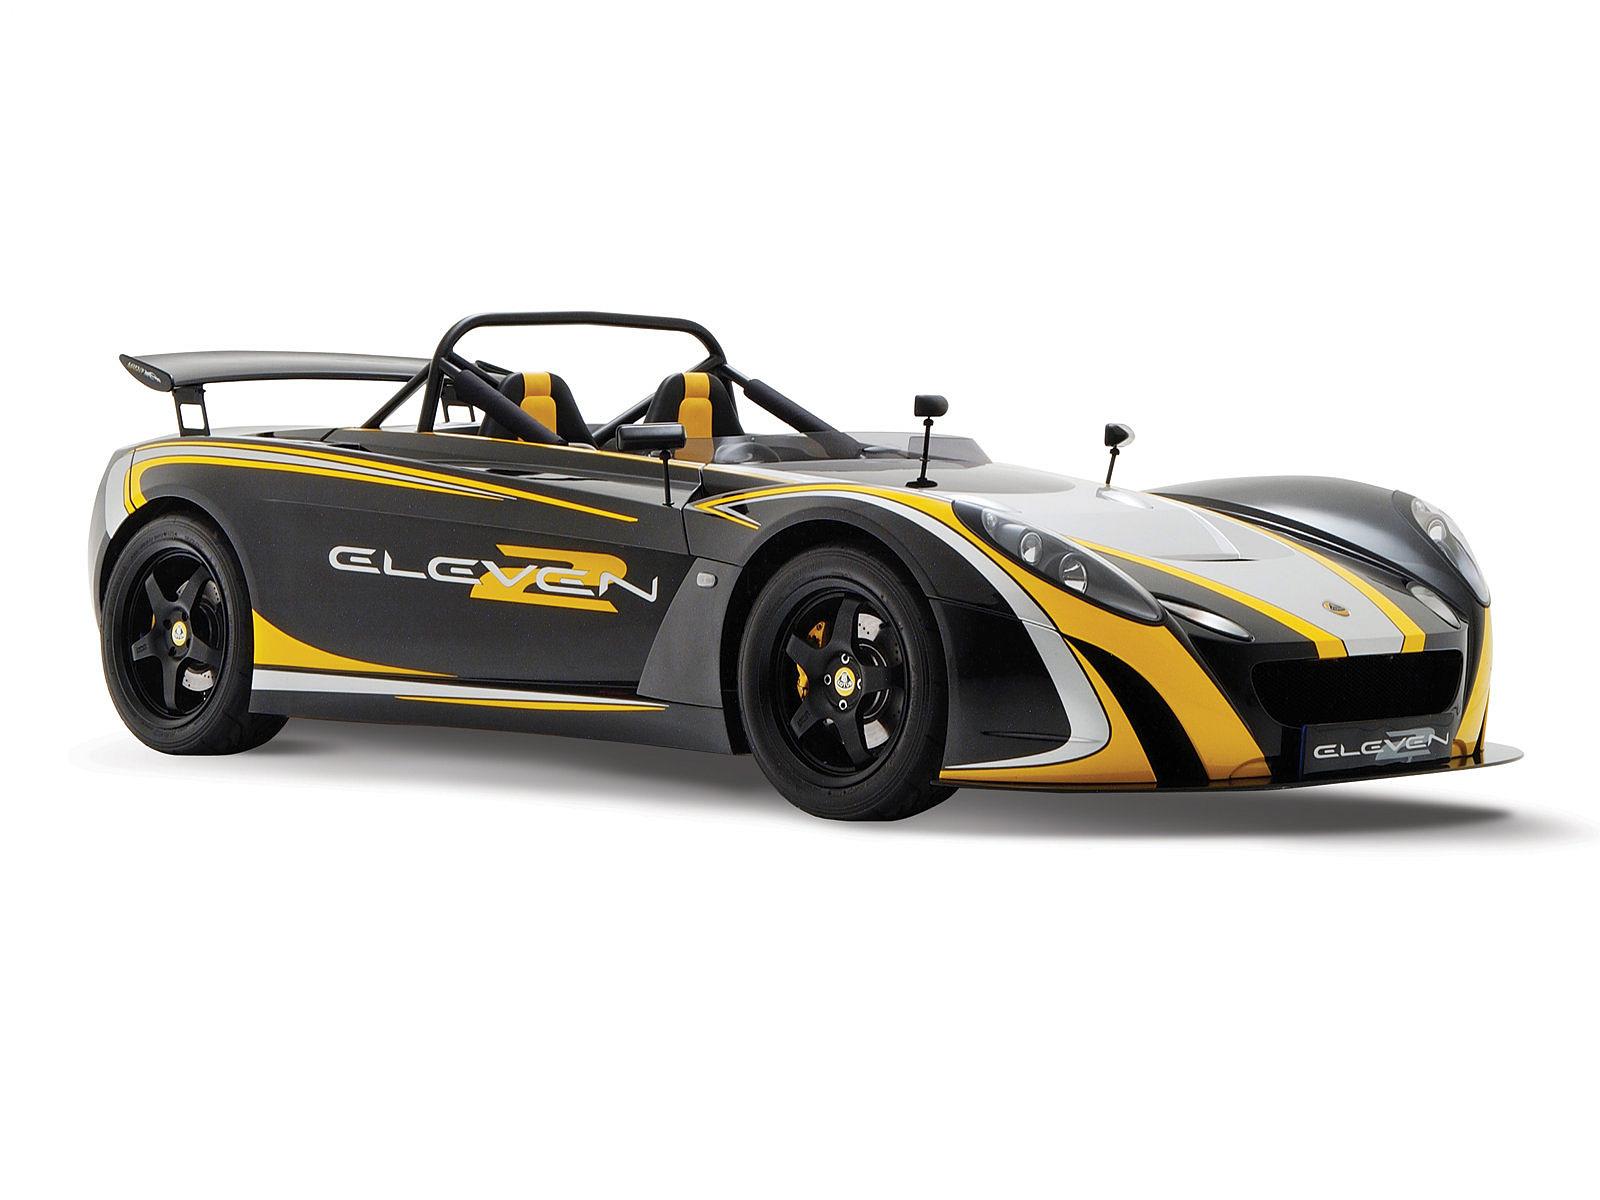 2007 Lotus 2 Eleven Car picture | Lotus car review |